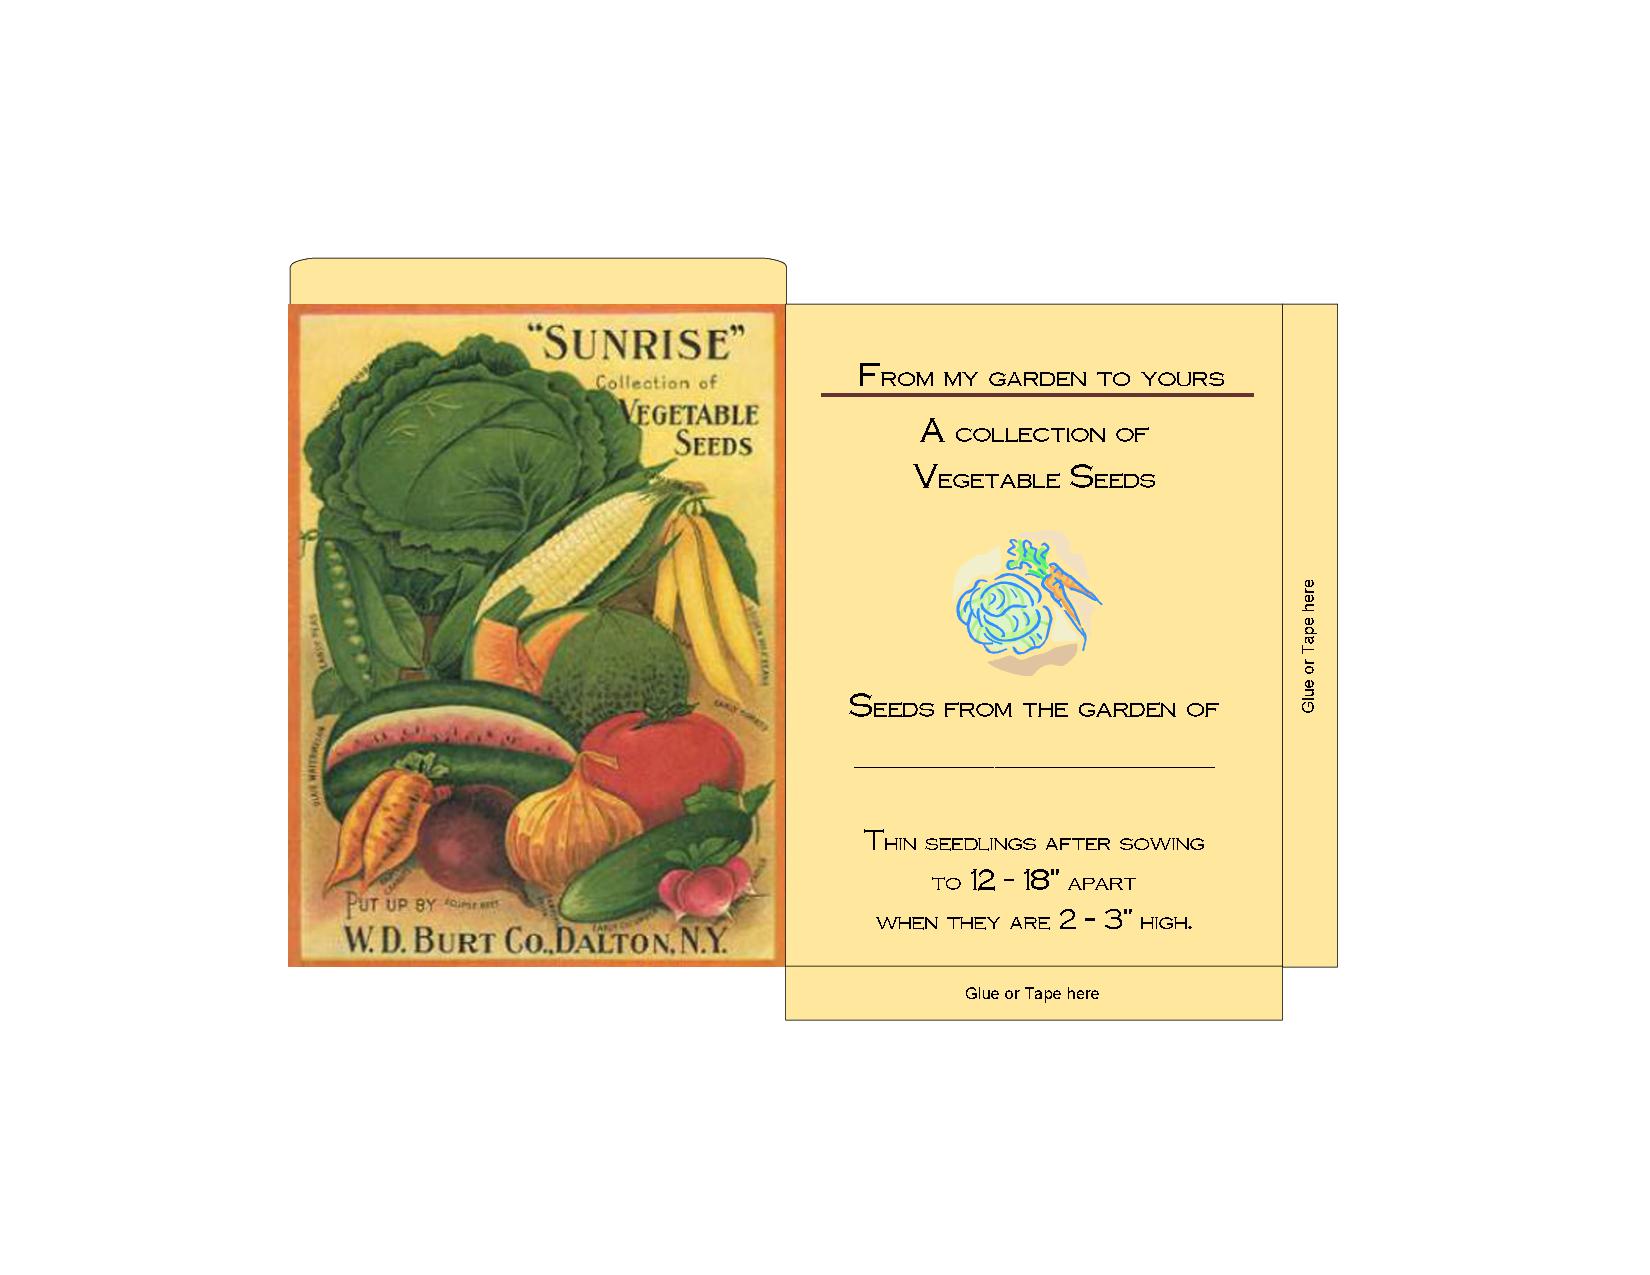 Vintage Seed Packet Clip Art